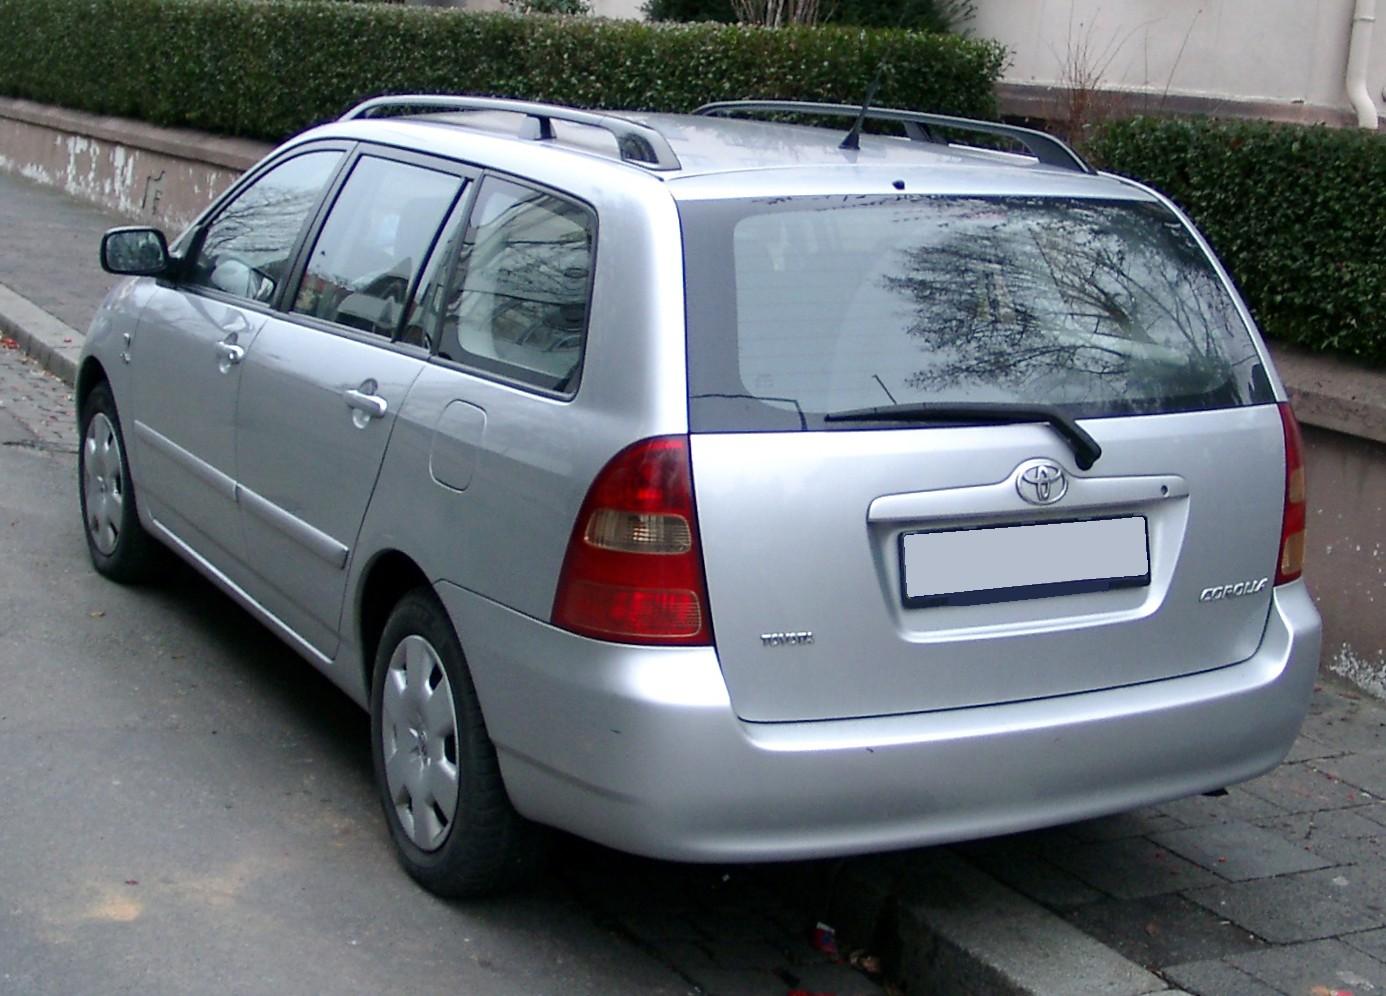 [Slika: Toyota_Corolla_Kombi_rear_20080103.jpg]